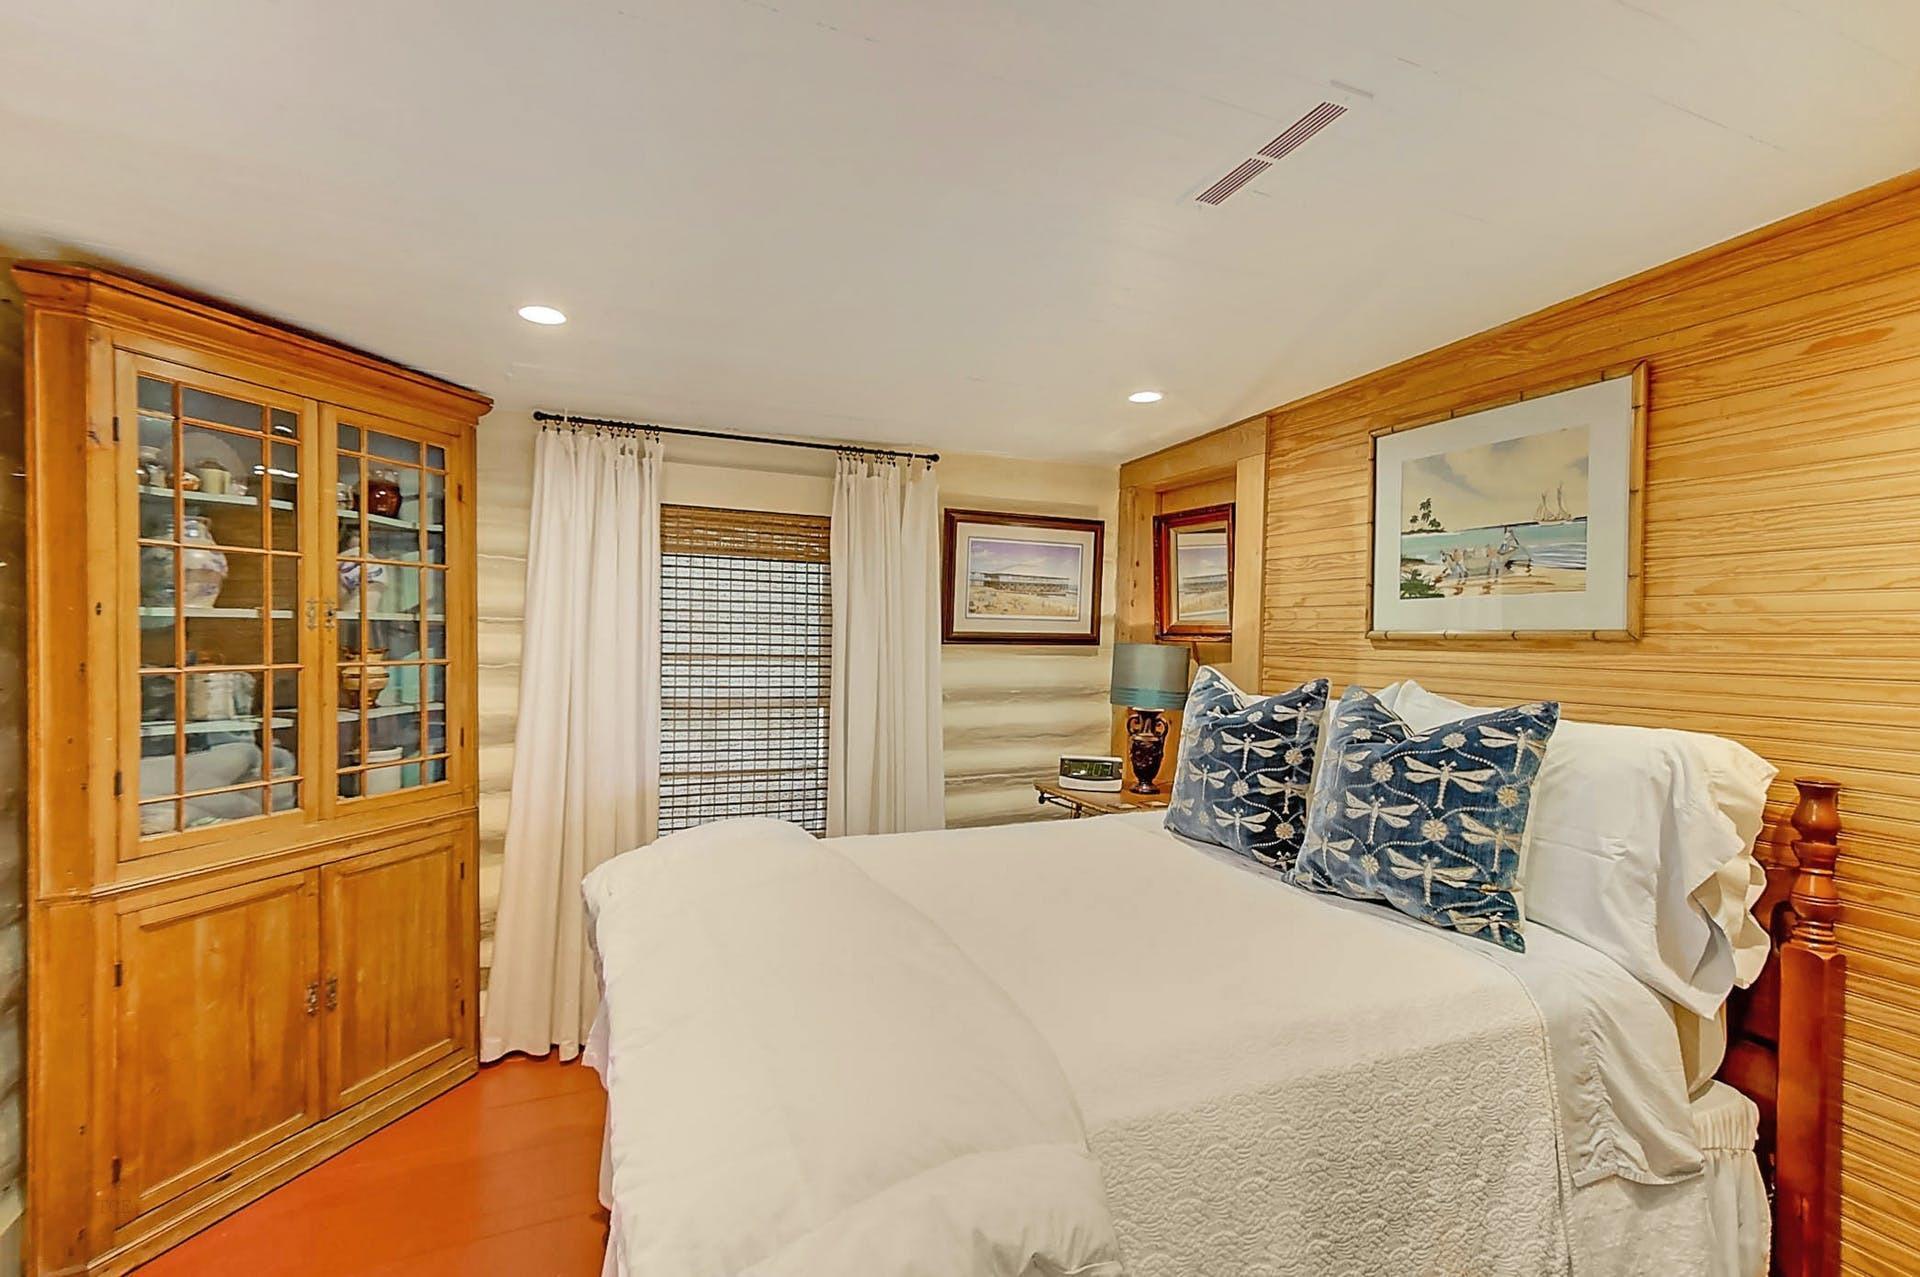 Folly Beach Homes For Sale - 306 Cooper, Folly Beach, SC - 3